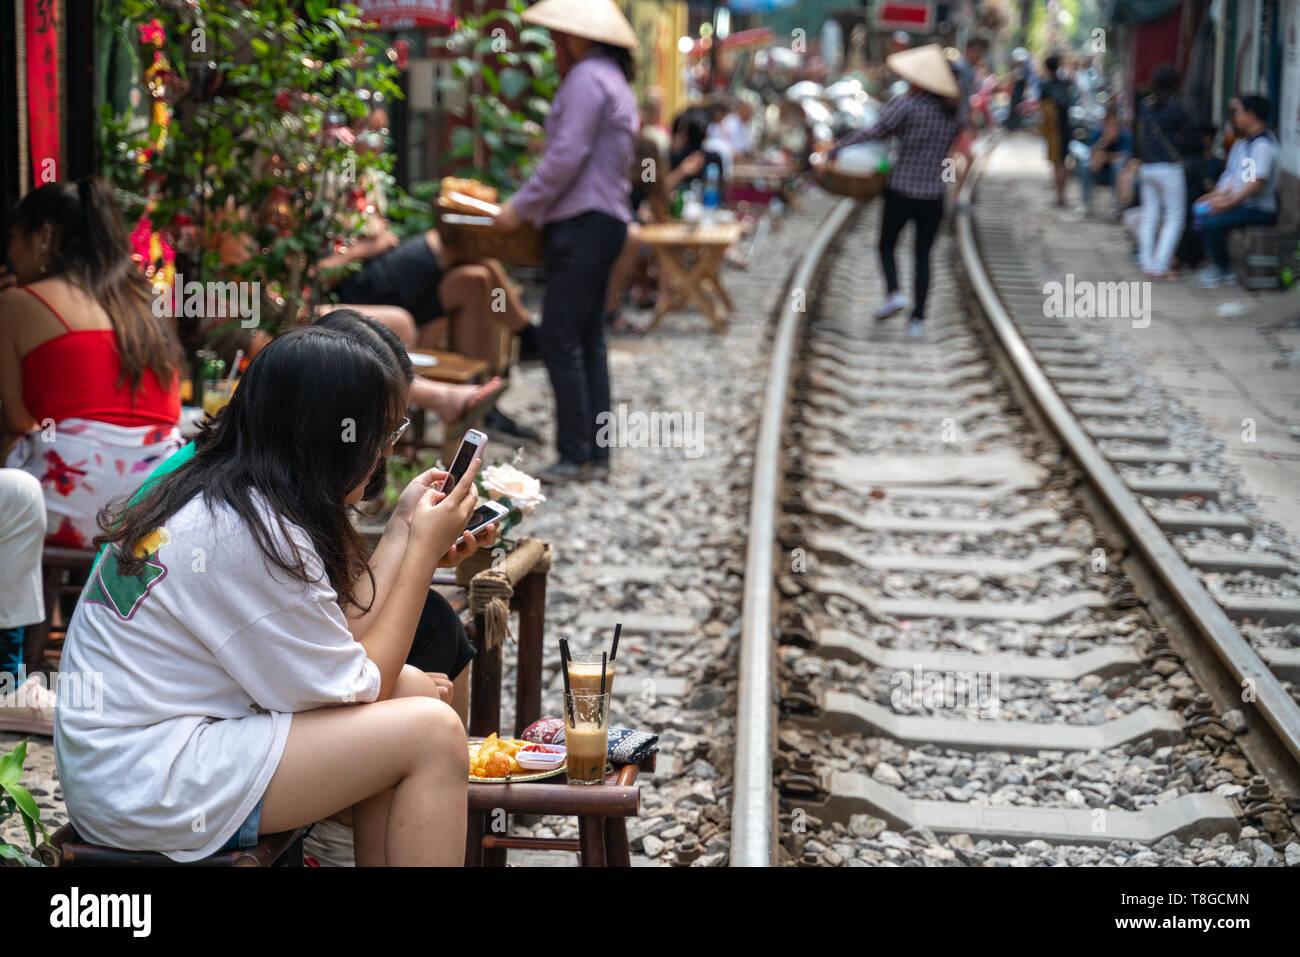 Railway Cafe People Drink Coffee Or Walking On Railways Waiting For Train To Arrive On Railway Road In Hanoi Vietnam Stock Photo Alamy